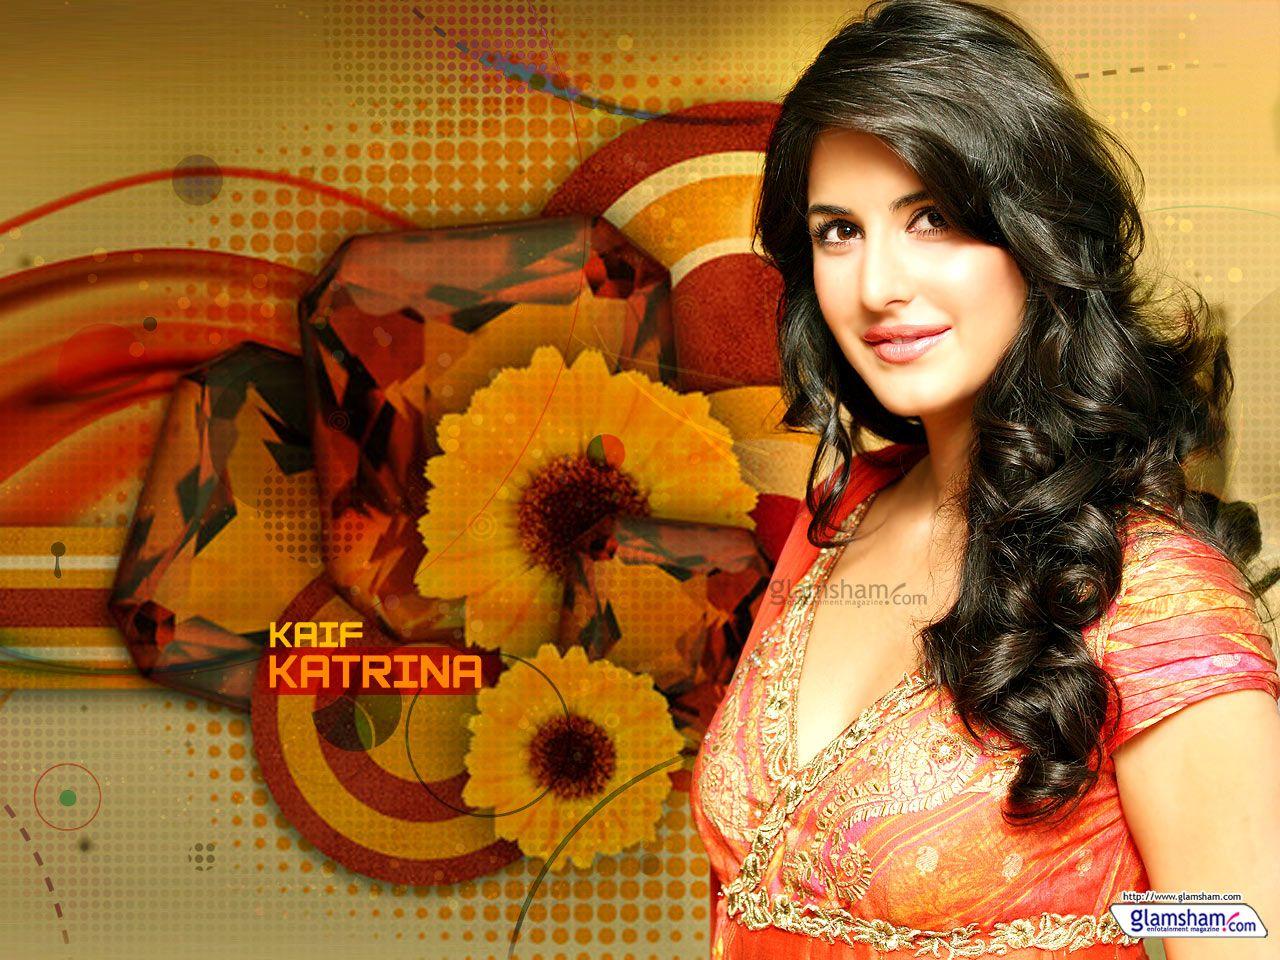 Download katrina kaif desktop wallpaer - Katrina Kaif Desktop Wallpapers 16363 At 1280x960 Resolution For Download Glamsham Com